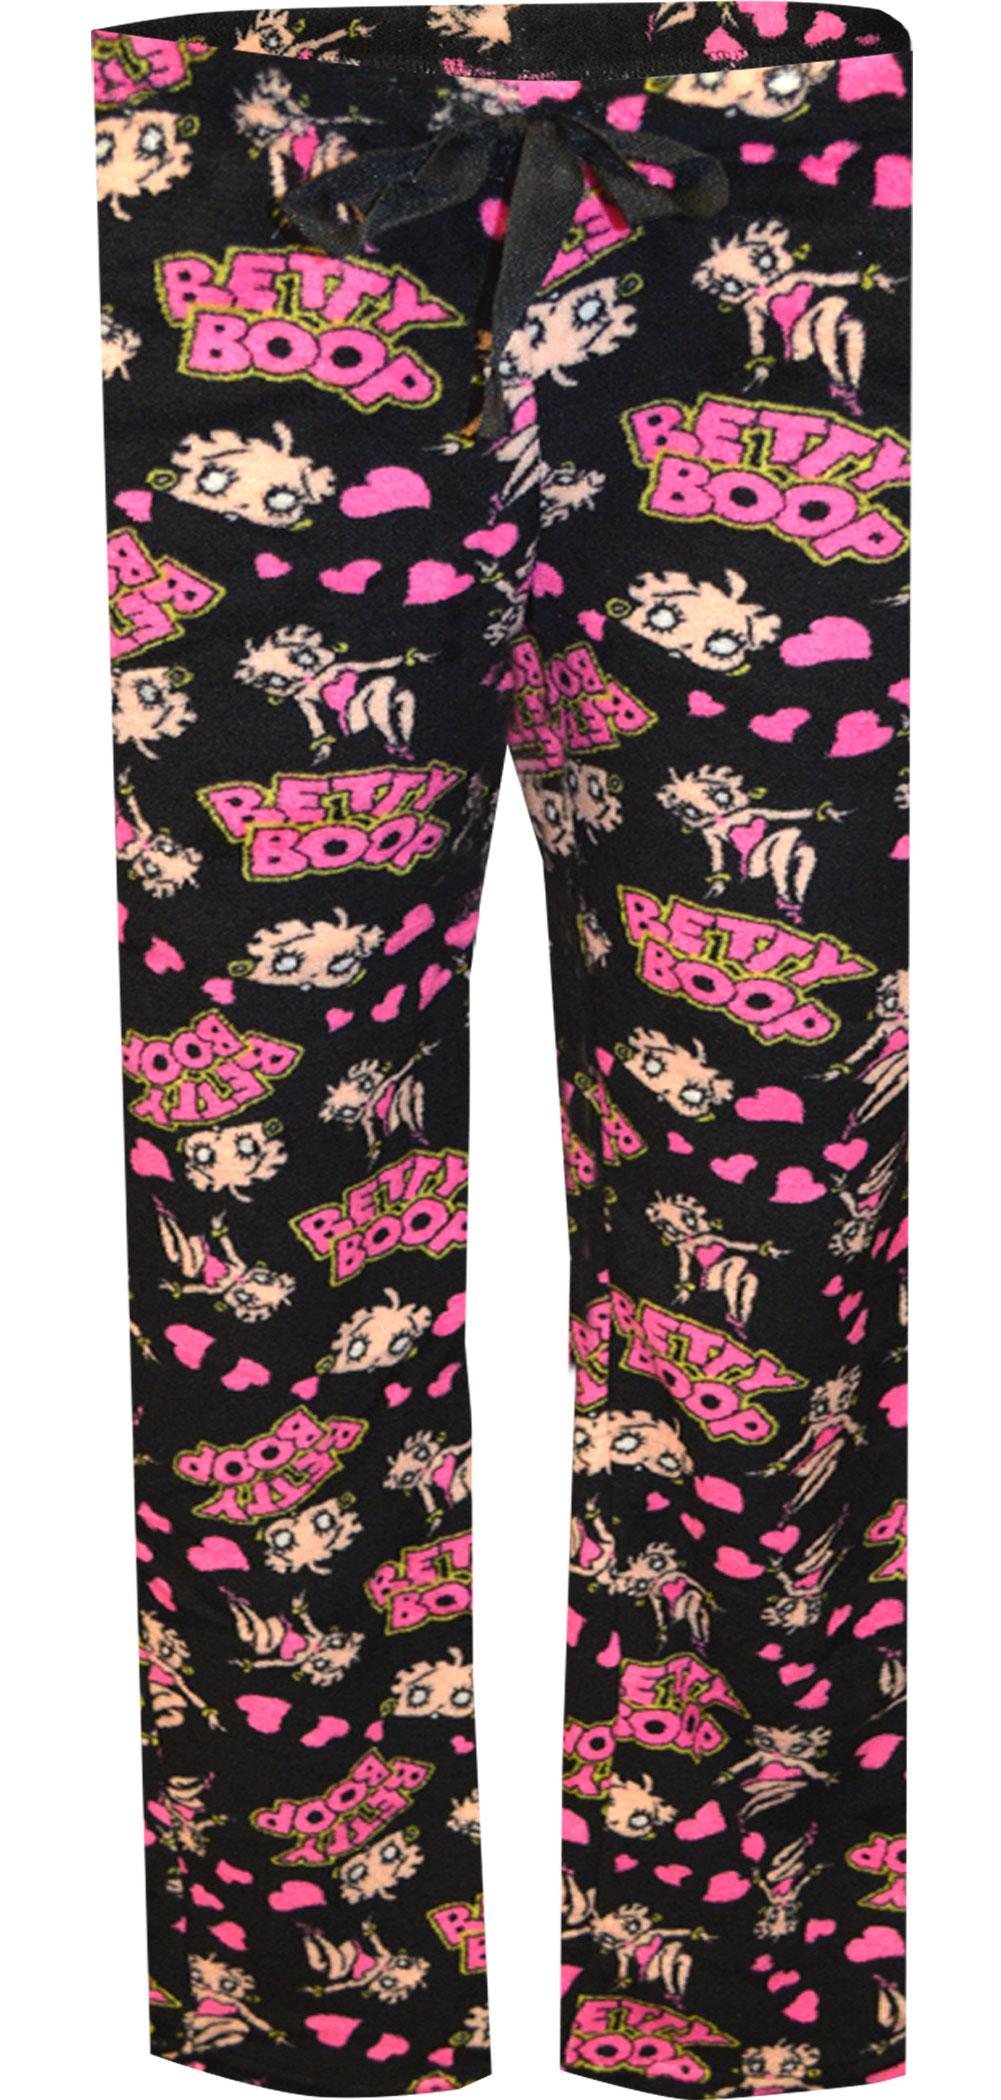 Image of Betty Boop Black Plush Lounge Pants for women